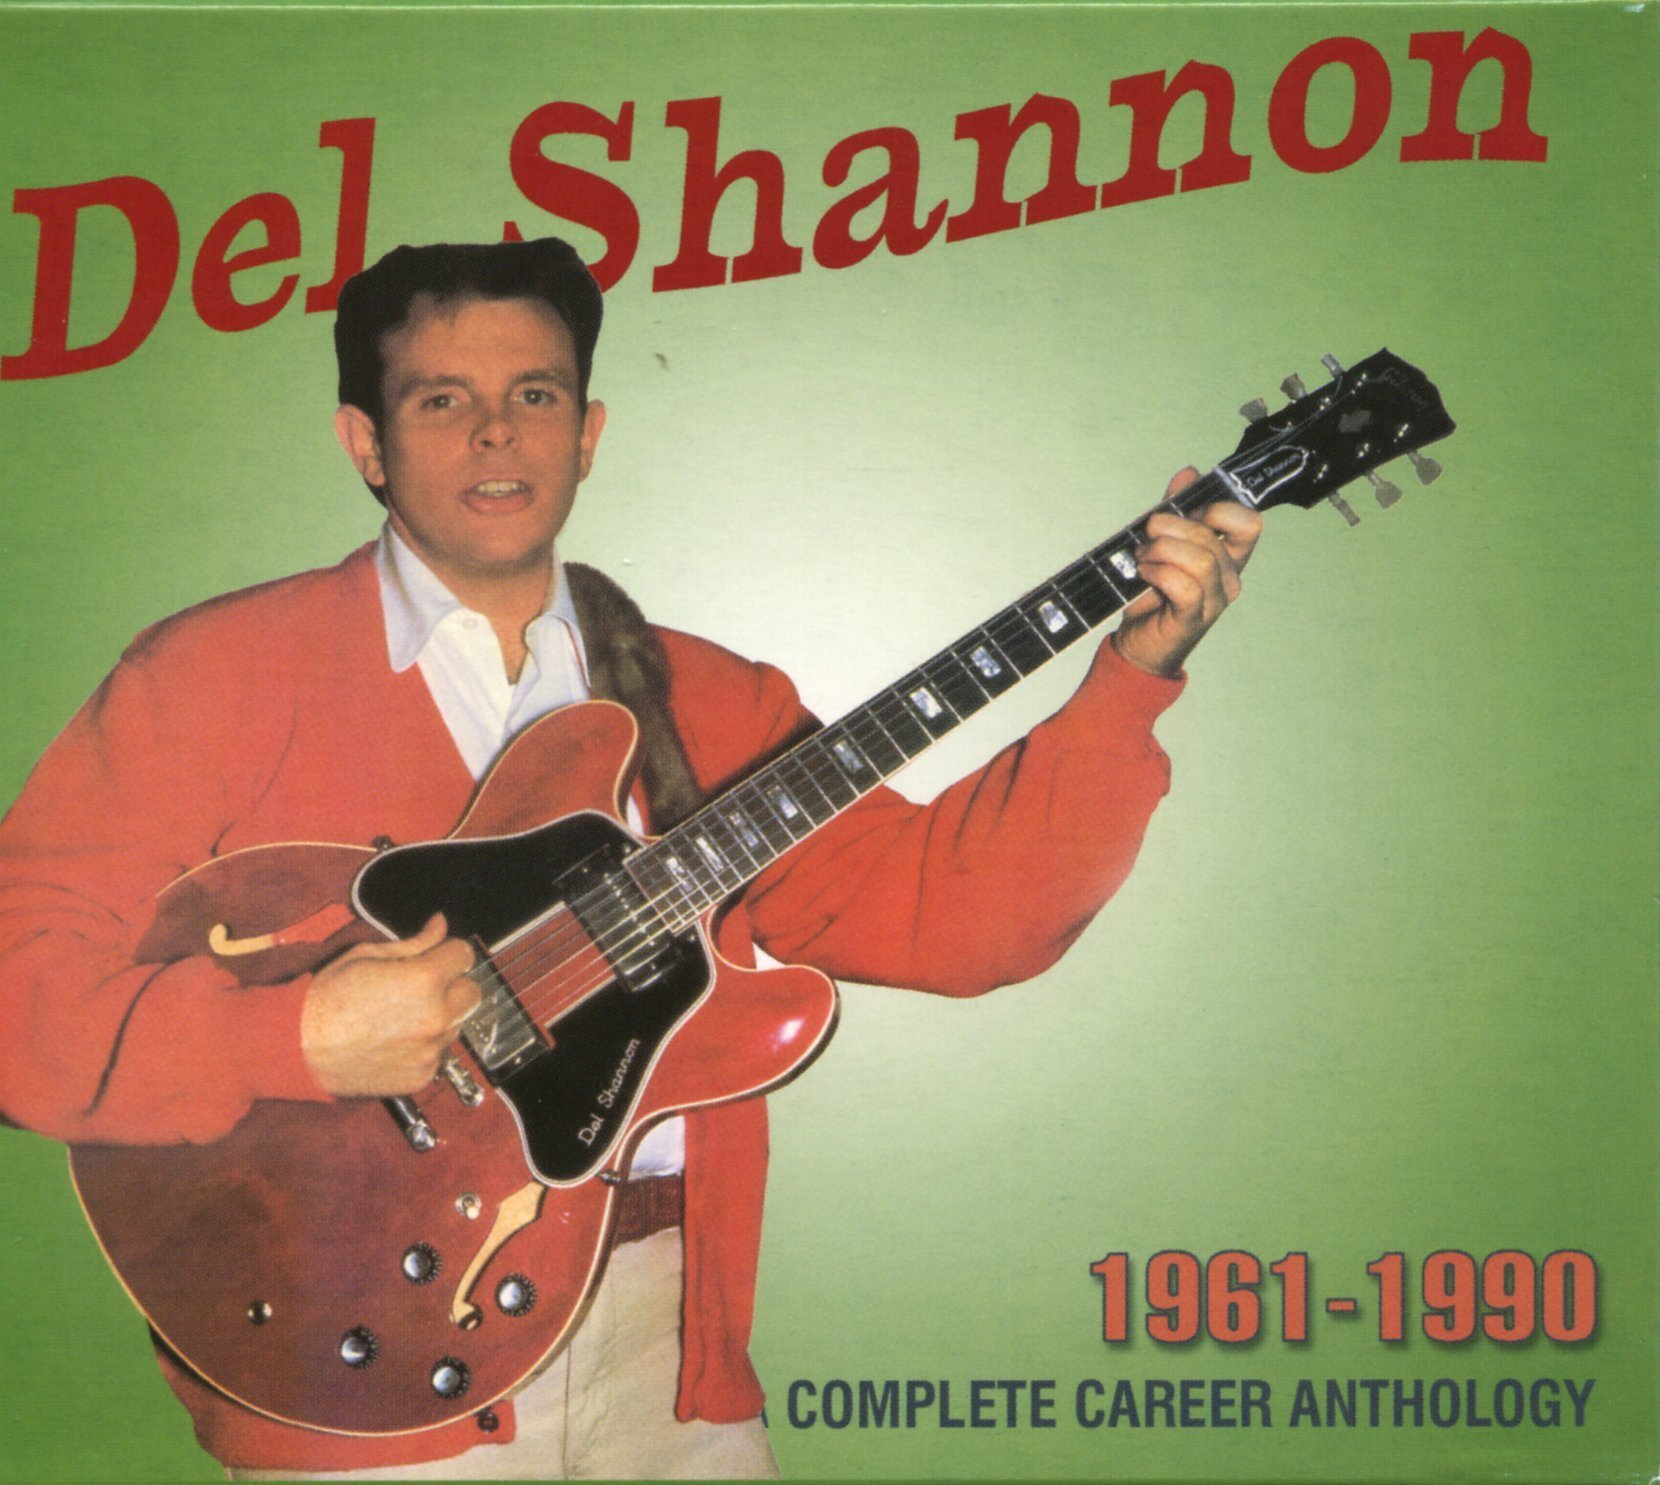 1961-1990: Complete Career Anthology